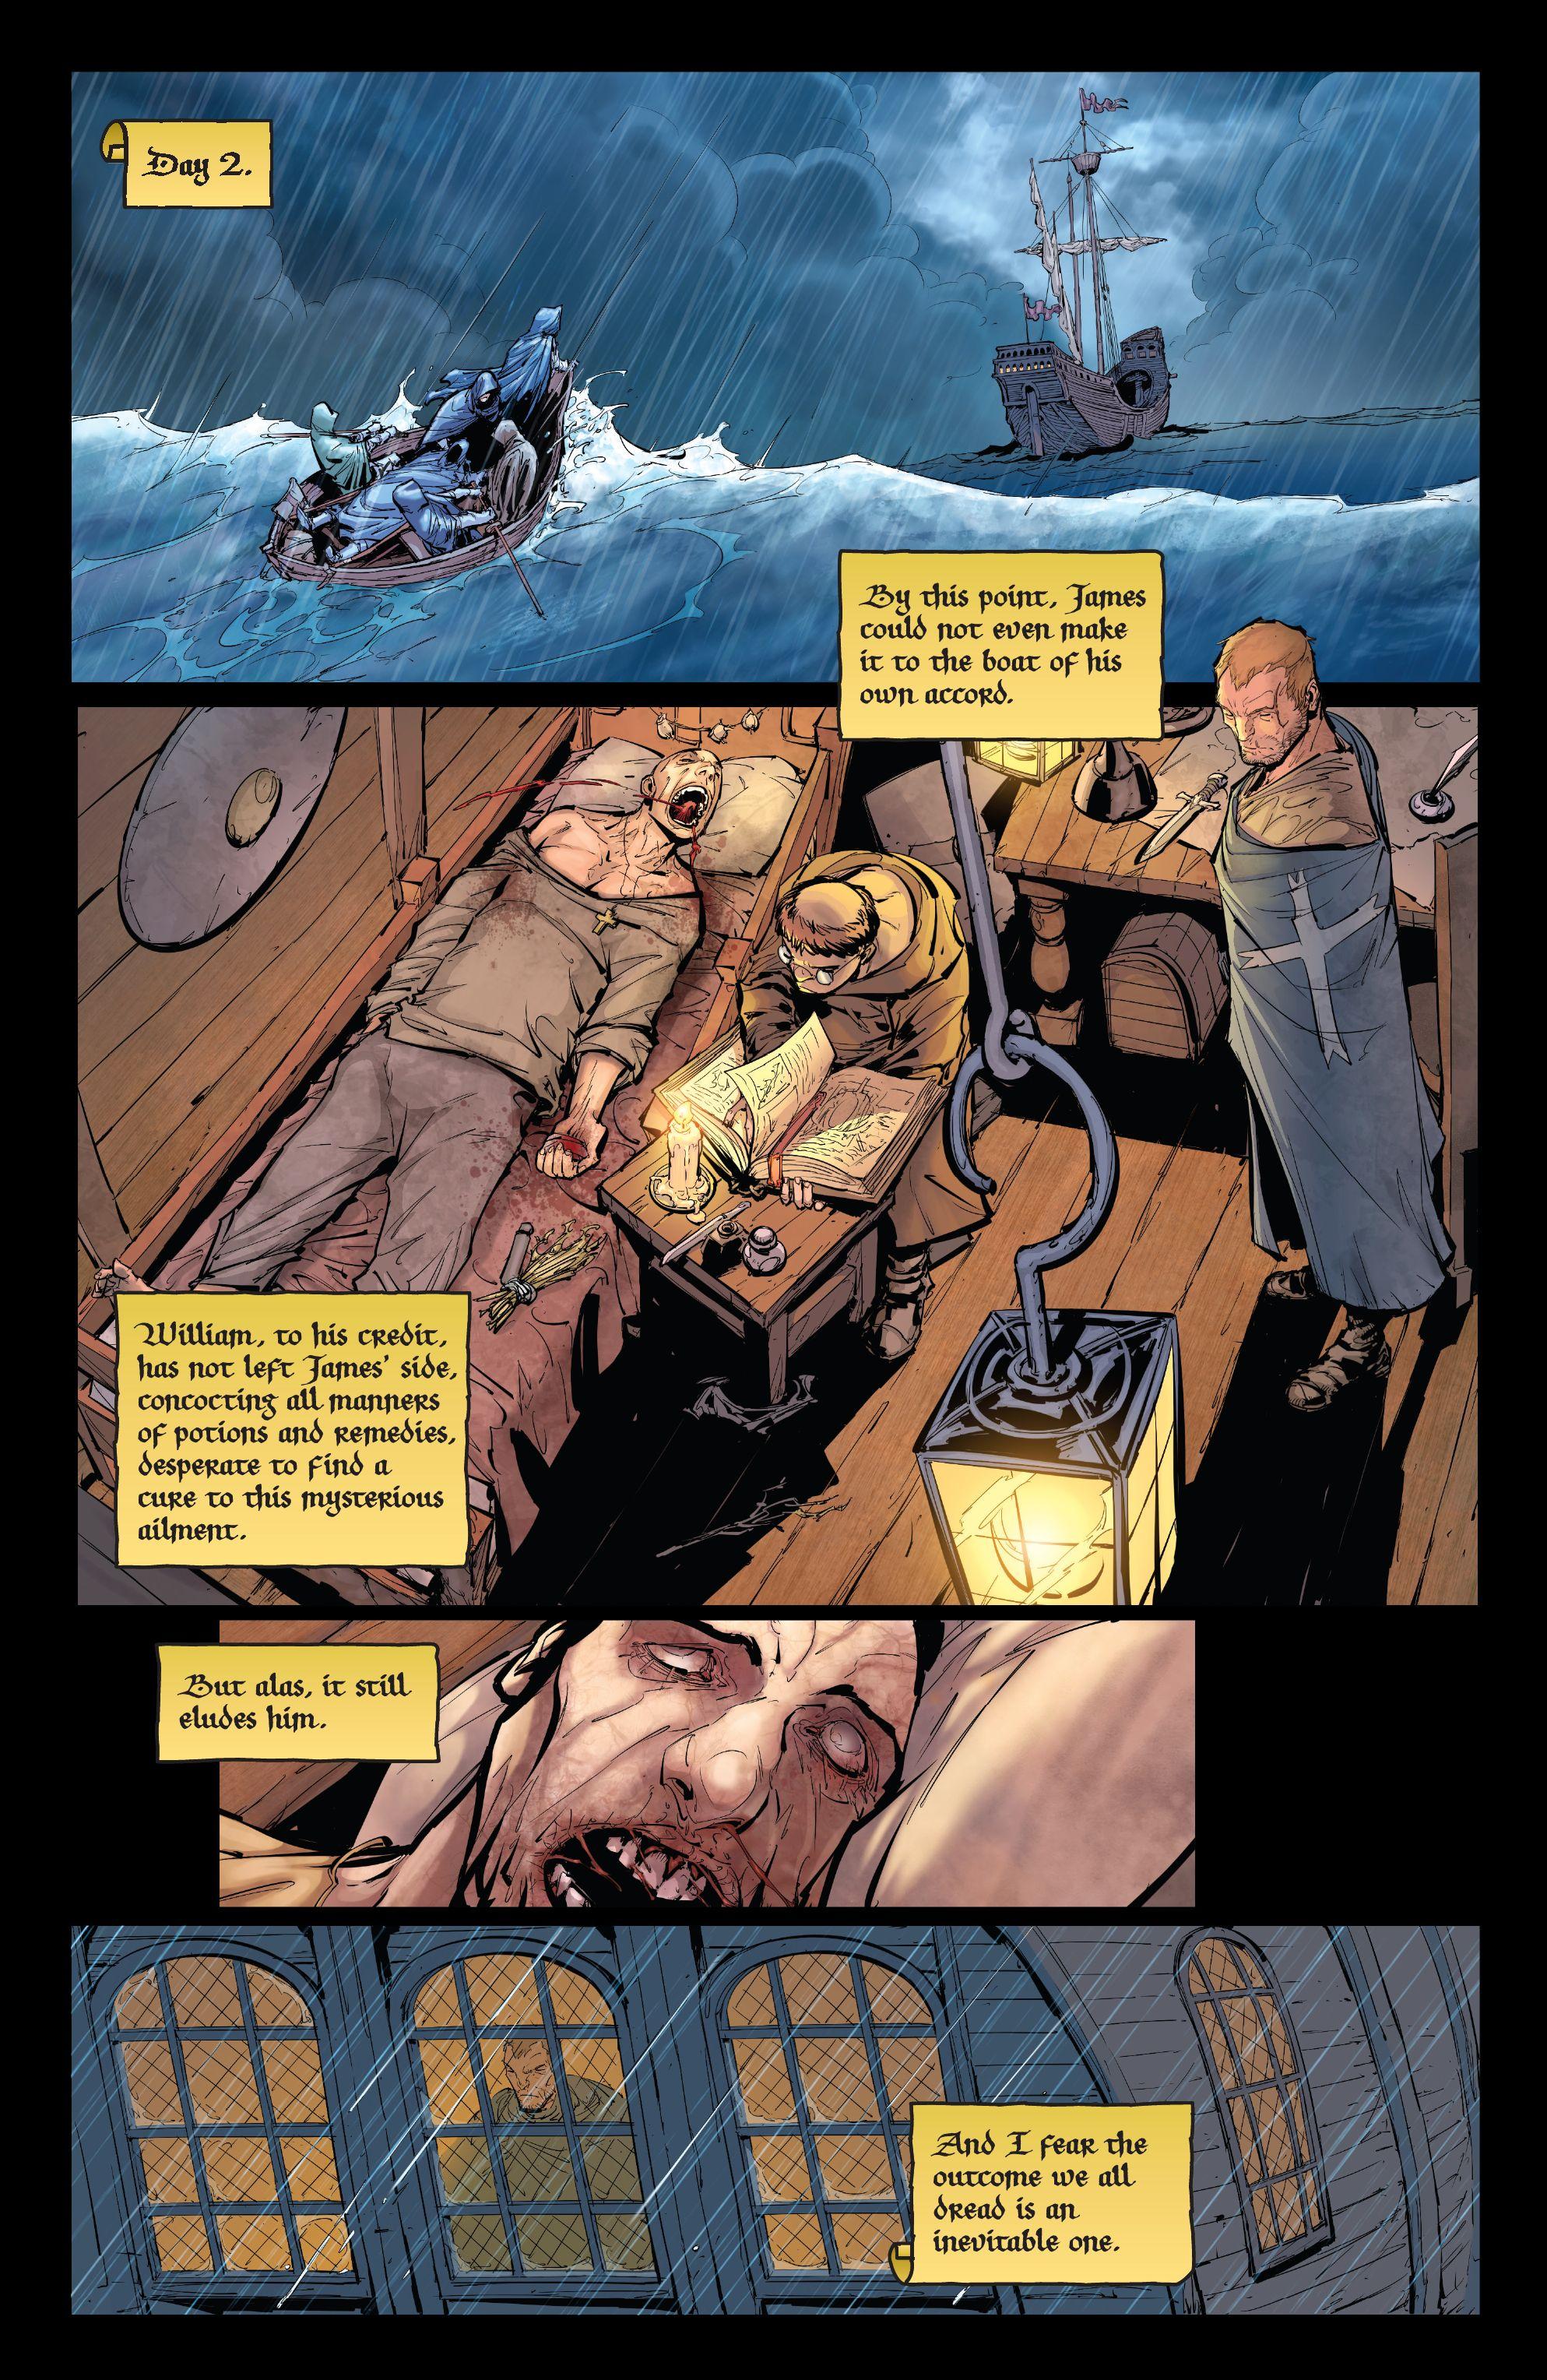 Read online Pestilence comic -  Issue #2 - 5